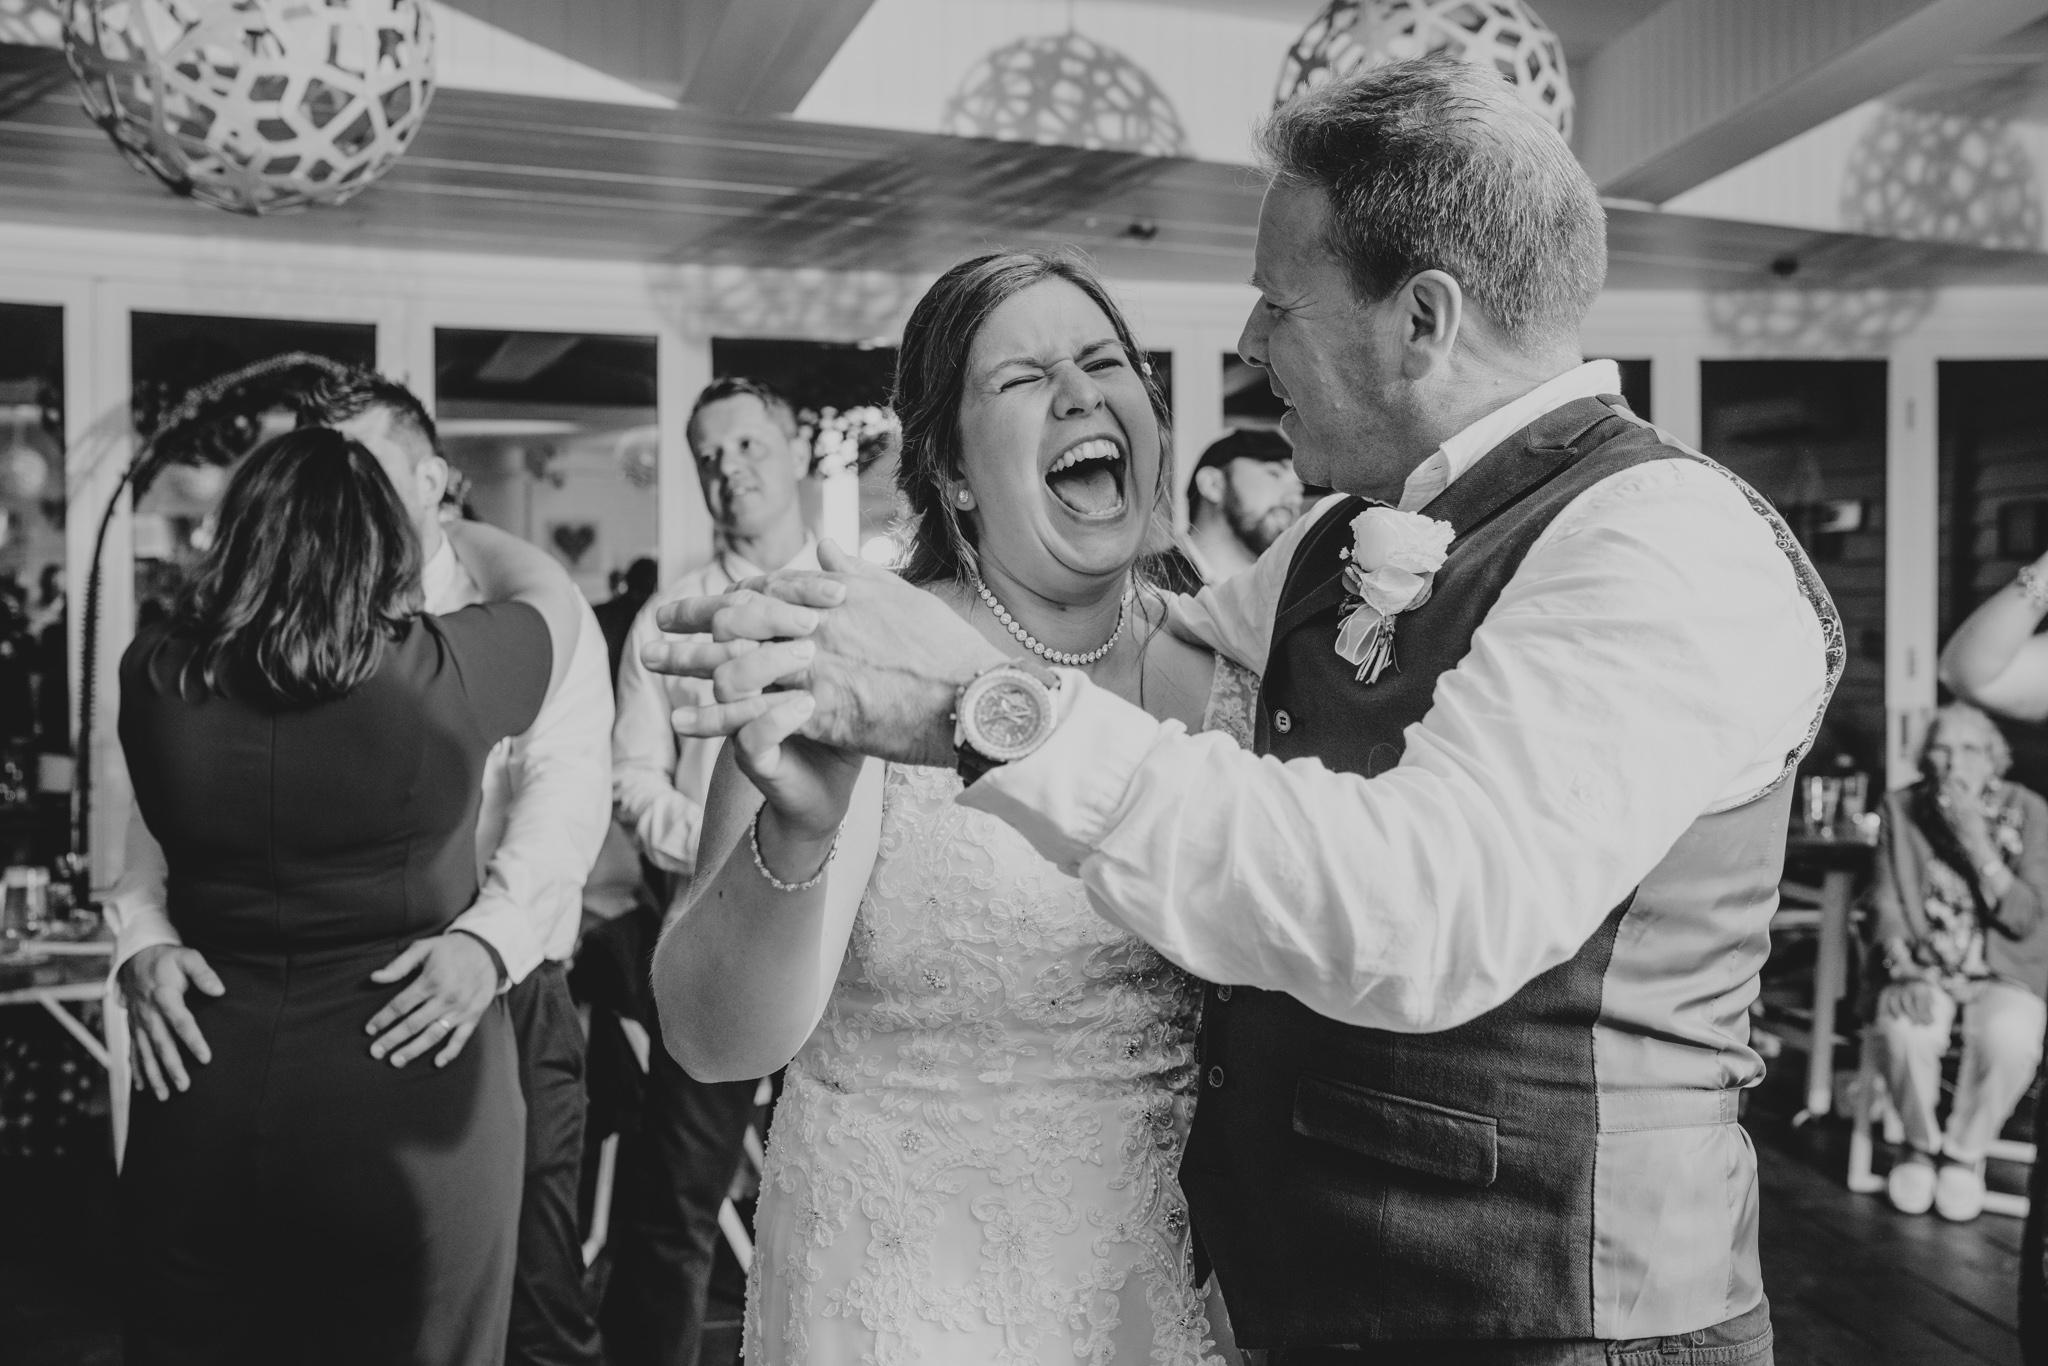 john-amy-relaxed-beach-wedding-tunnels-beaches-ilfracombe-north-devon-grace-elizabeth-colchester-essex-alternative-relaxed-wedding-photography-devon-suffolk-norfolk-essex (153 of 159).jpg